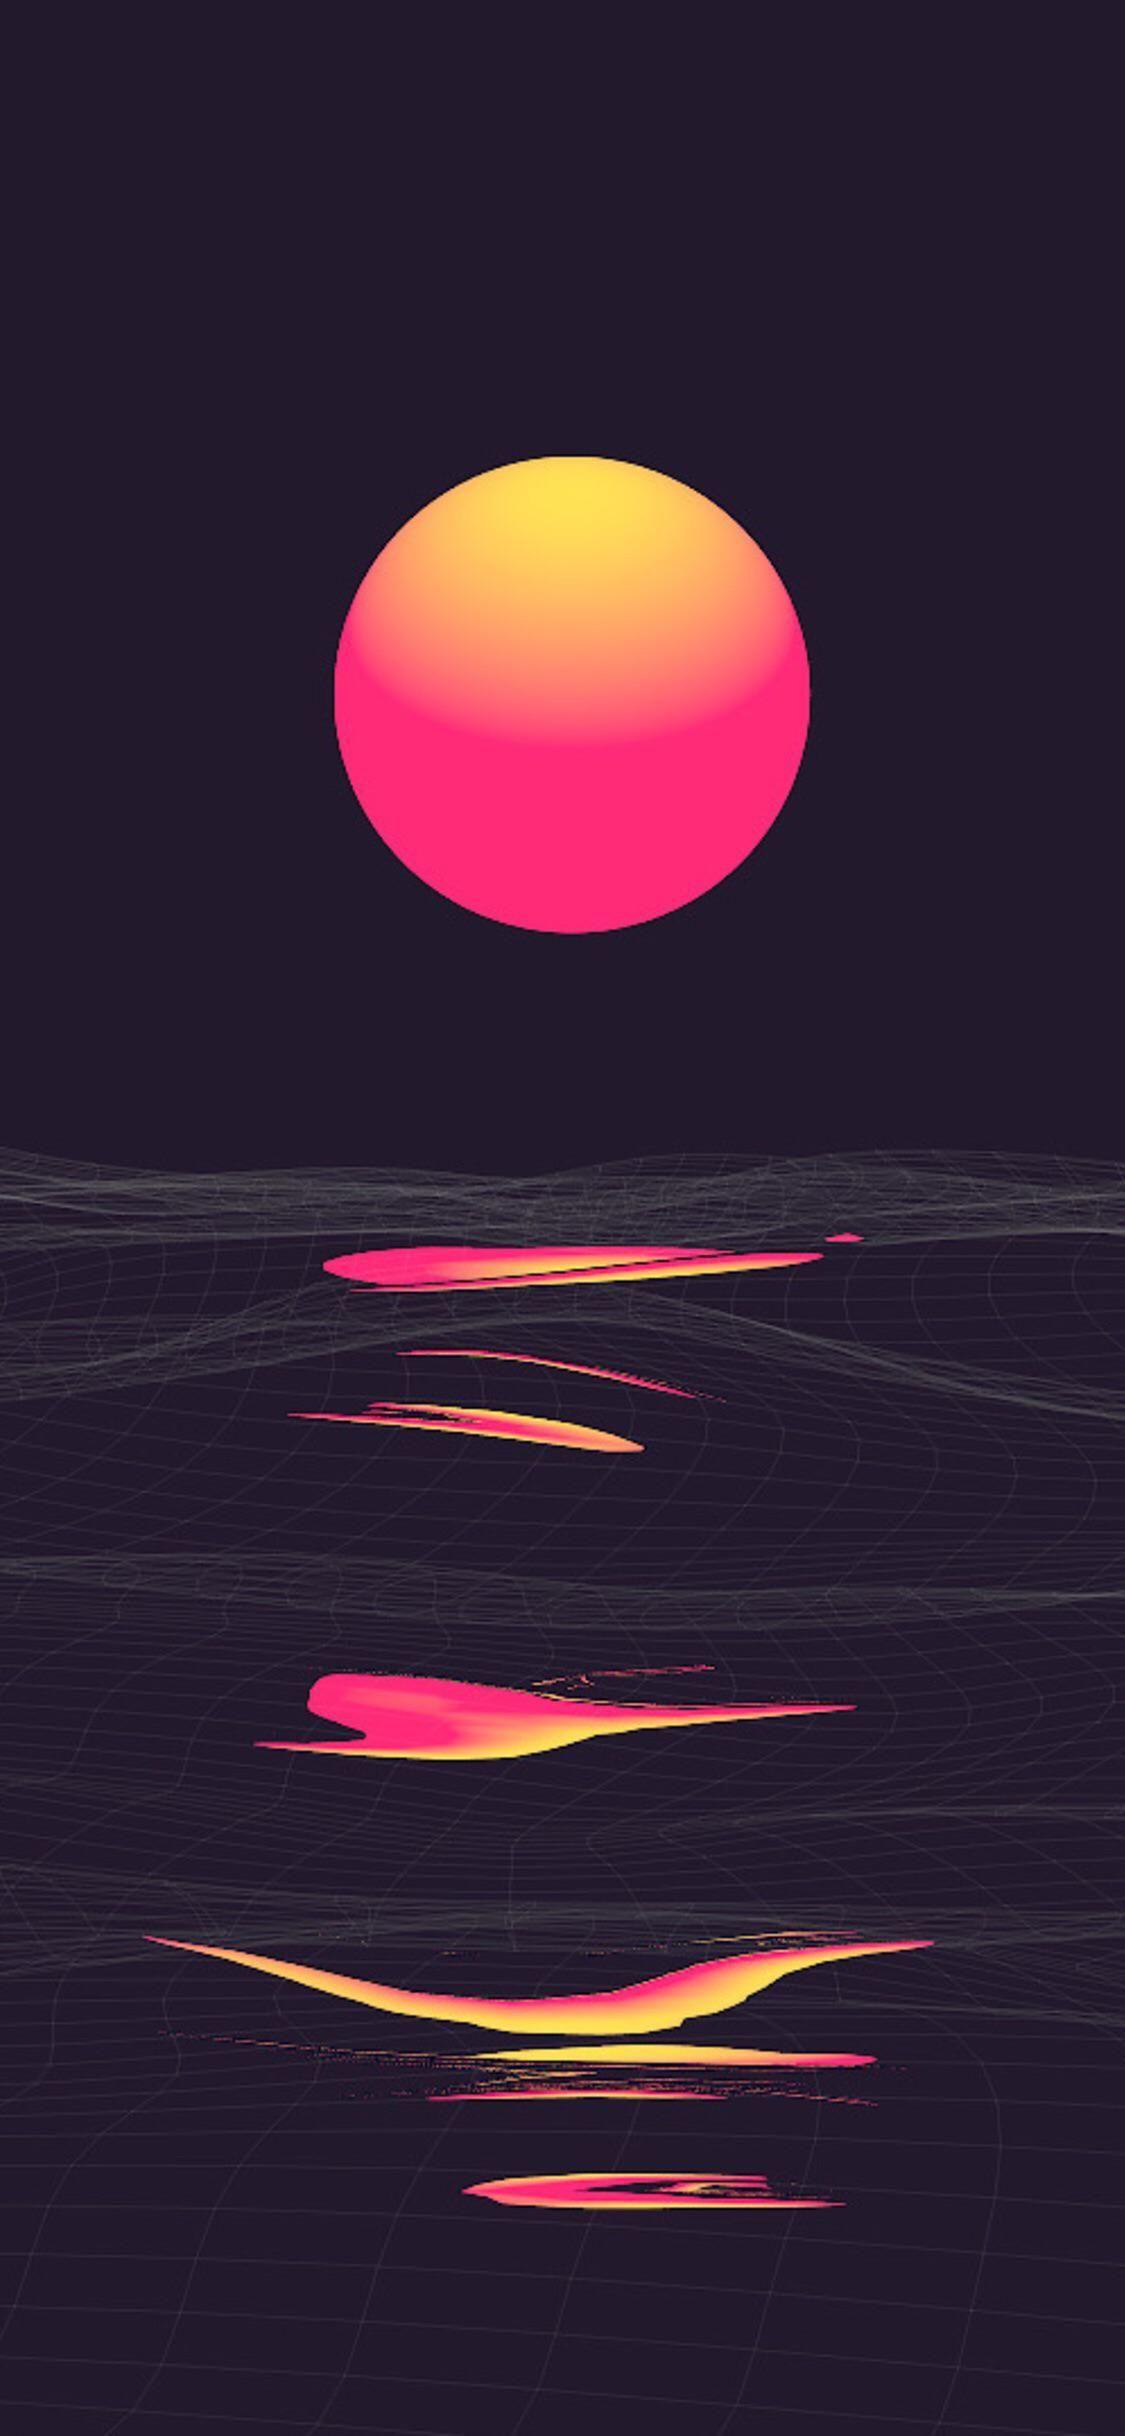 Retrowave Sunset Smart Phone Wallpapers 4kphonewallpapersreddit Iphonewallpapersreddit Redditw Retrowave In 2020 Vaporwave Wallpaper Dark Wallpaper Phone Wallpaper